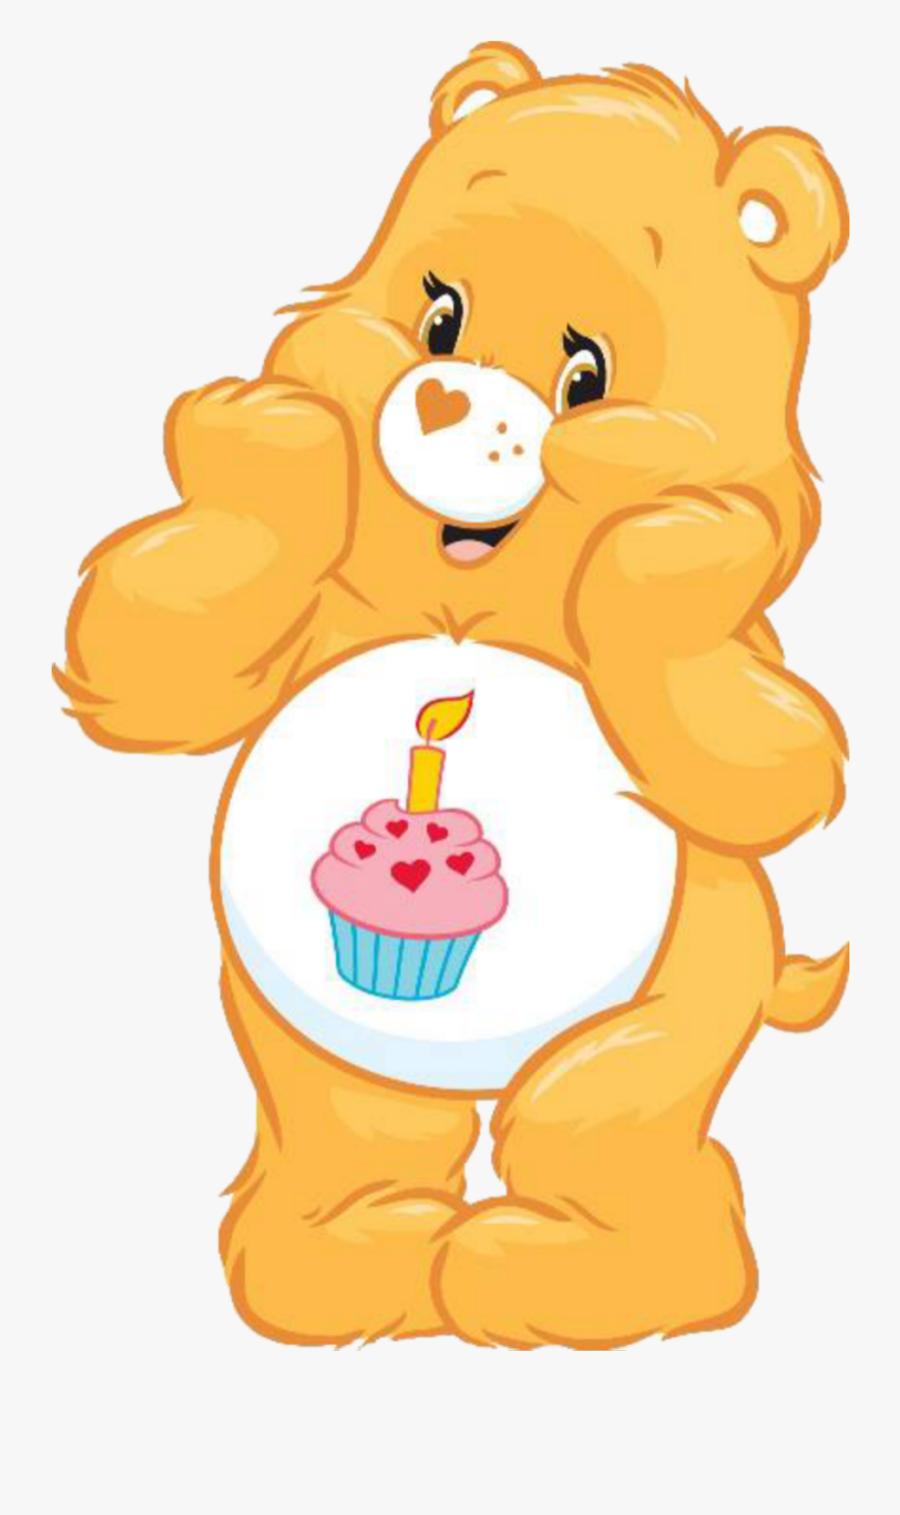 Fine Freetoedit Carebear Carebears Birthday Birthdaybear Tender Funny Birthday Cards Online Alyptdamsfinfo